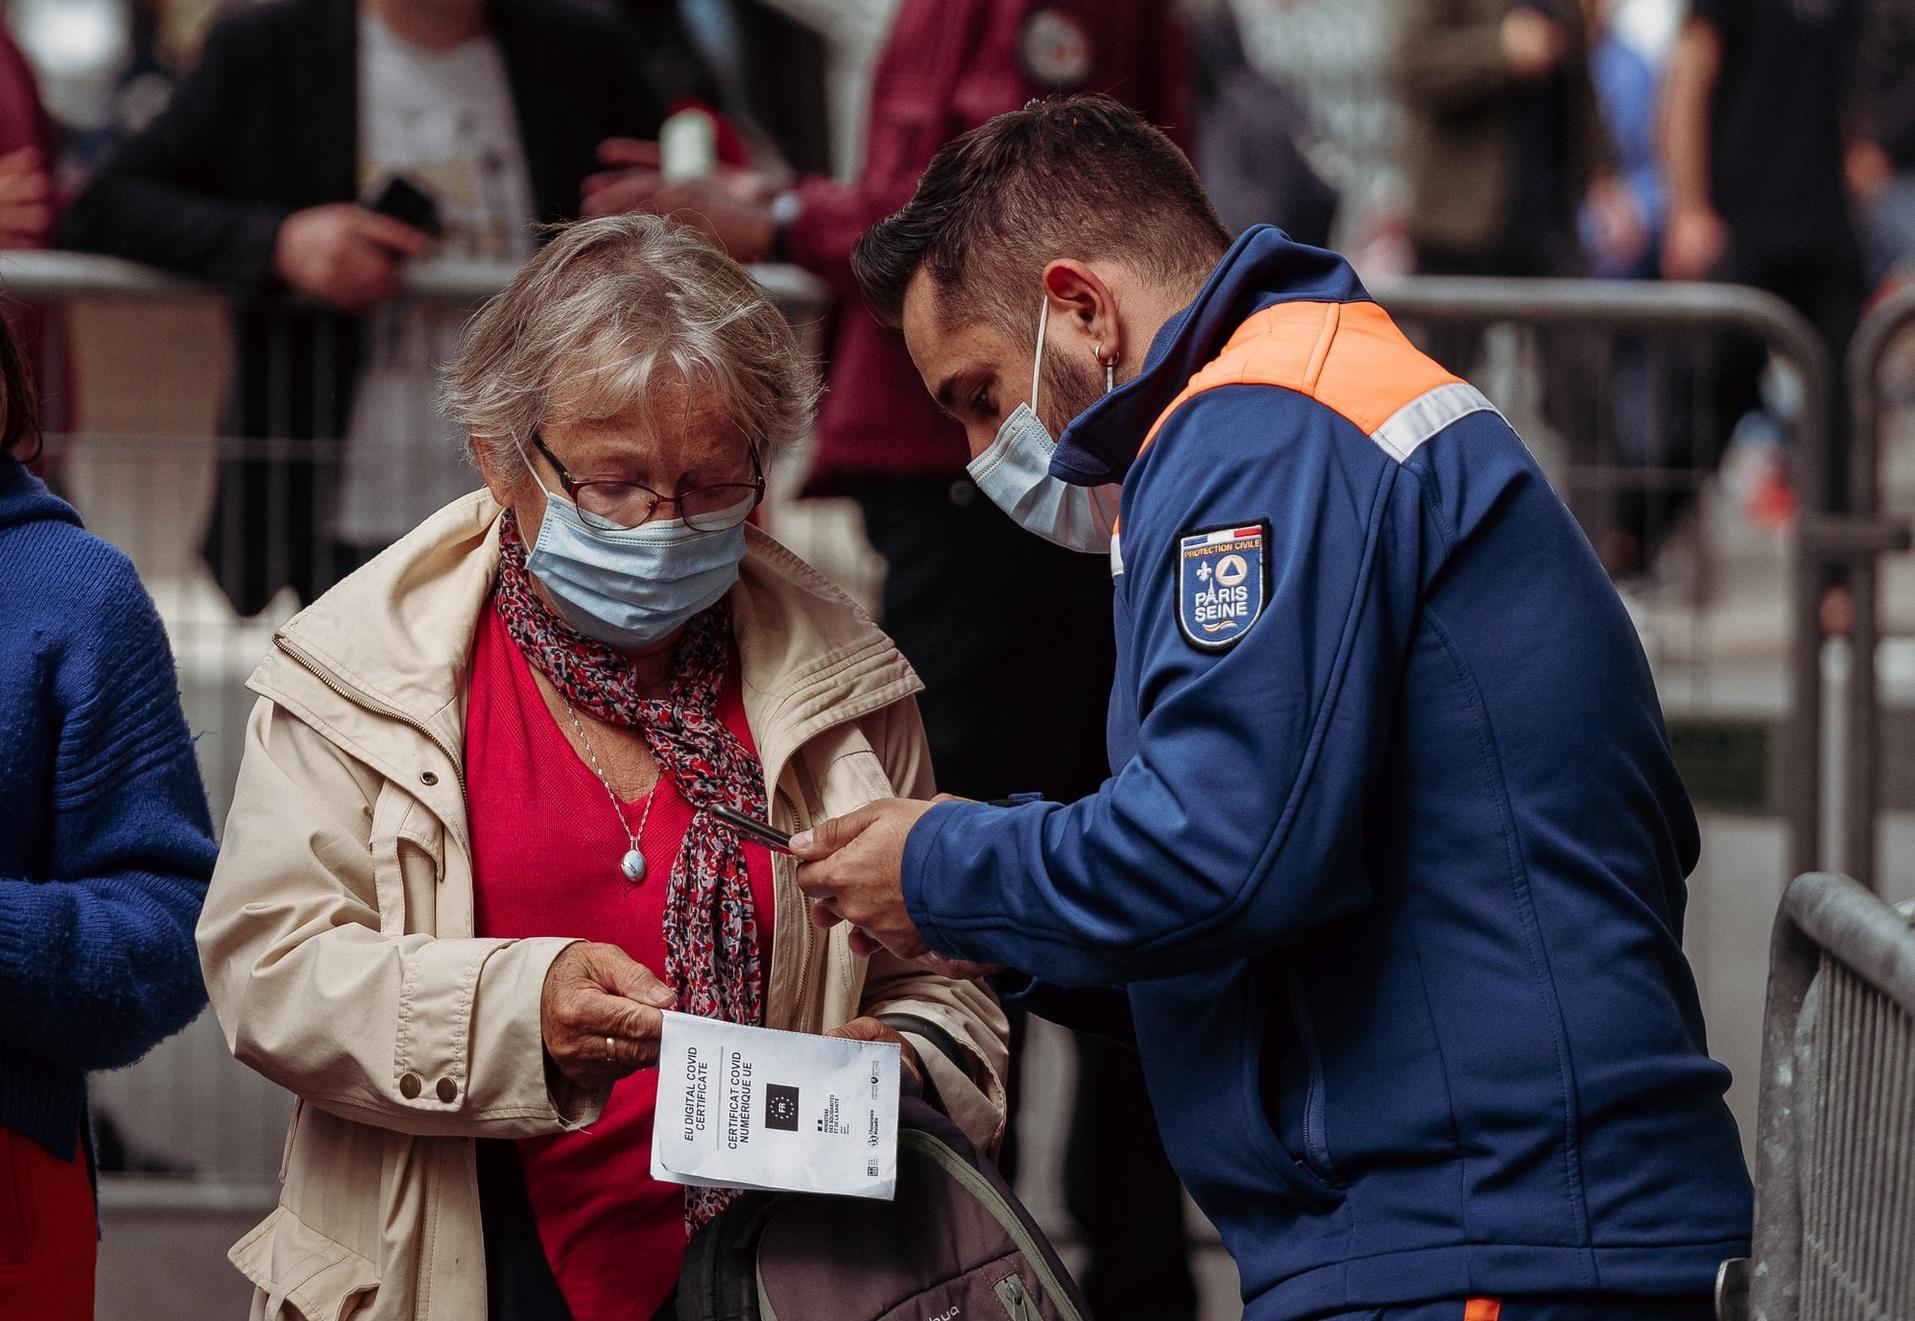 Police checks proof of COVID-19 vaccine documentation